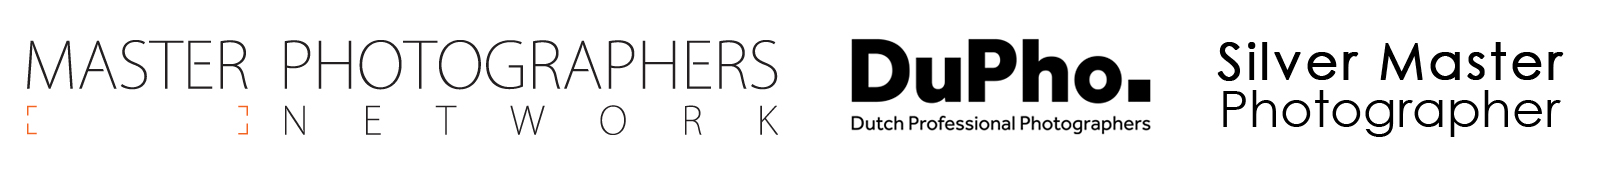 DuPho Dutch Professional Photographers